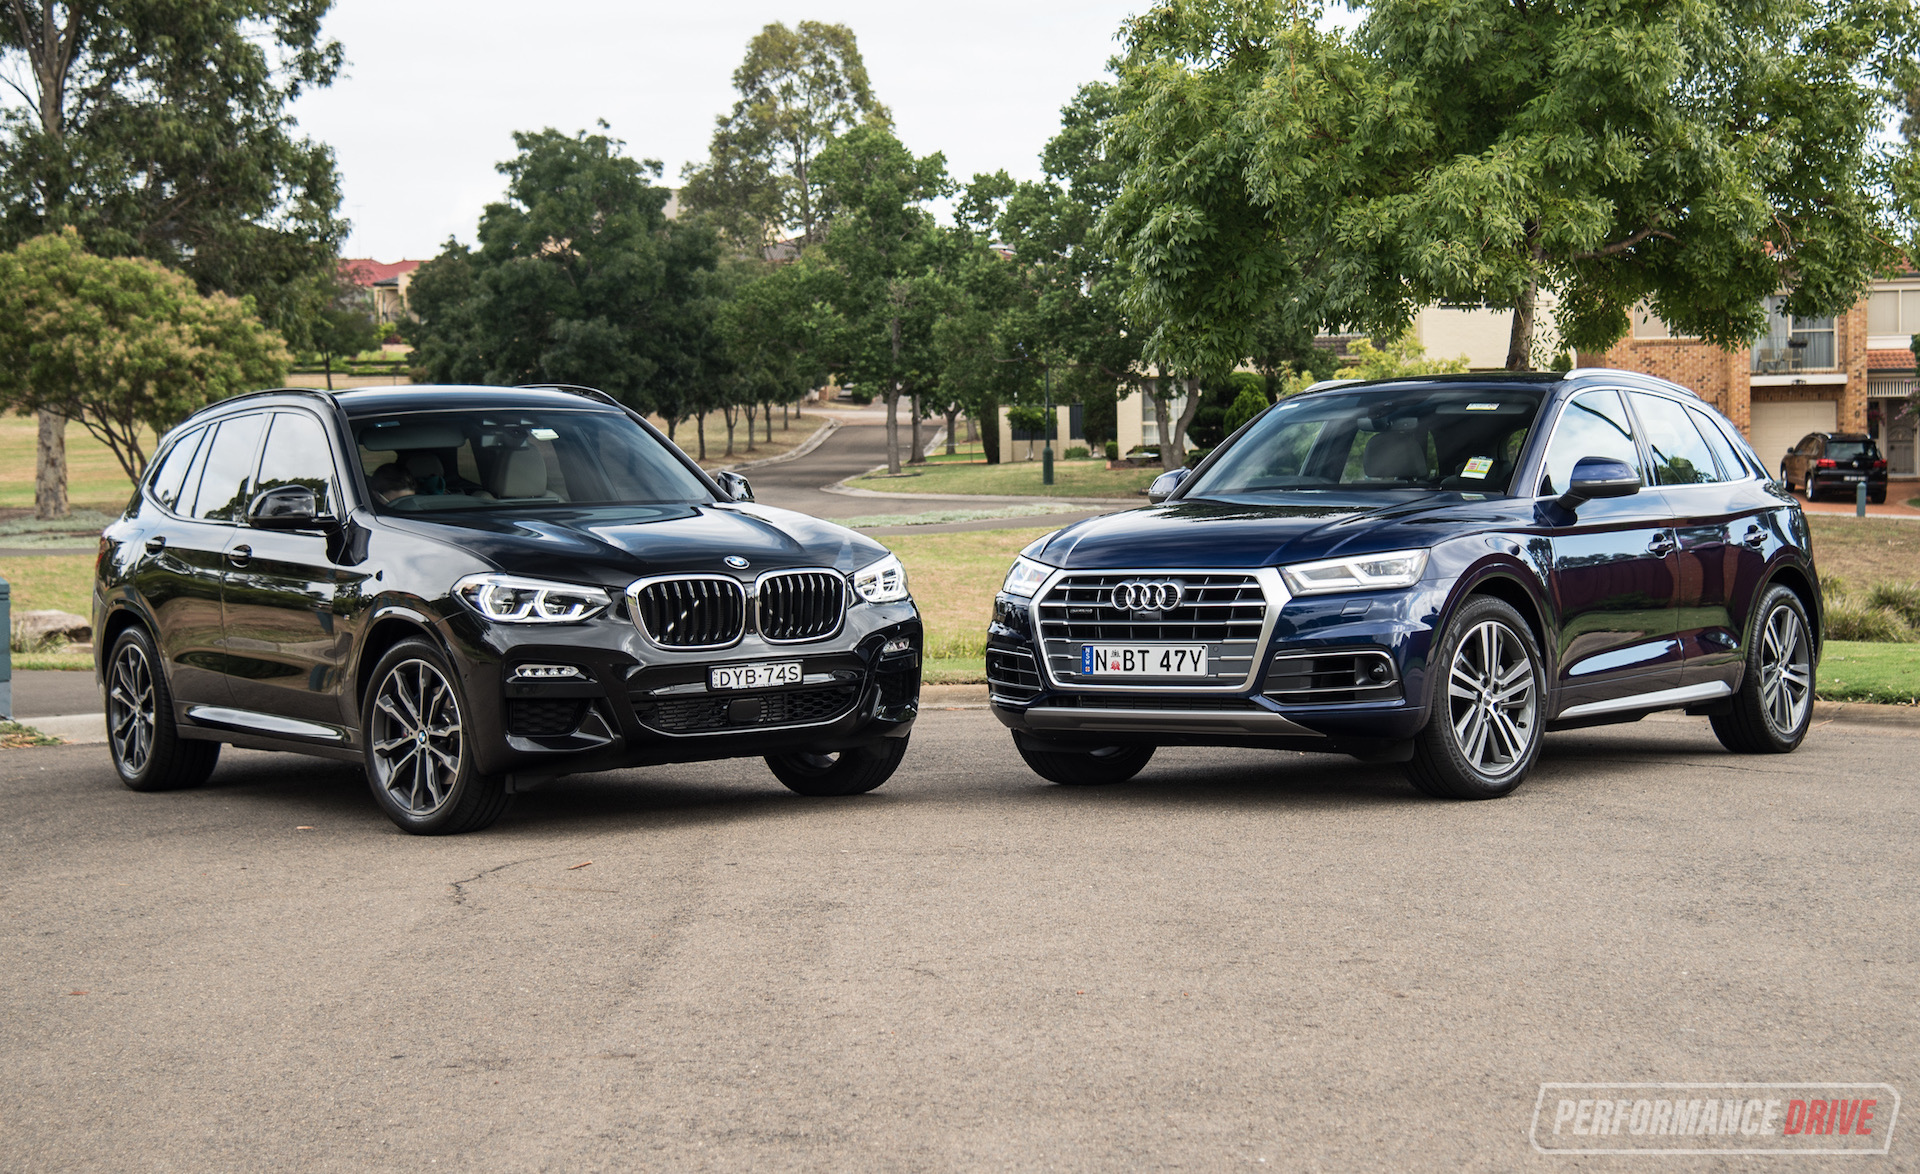 2019 Audi Q5 Vs Bmw X3 Mid Size Suv Comparison